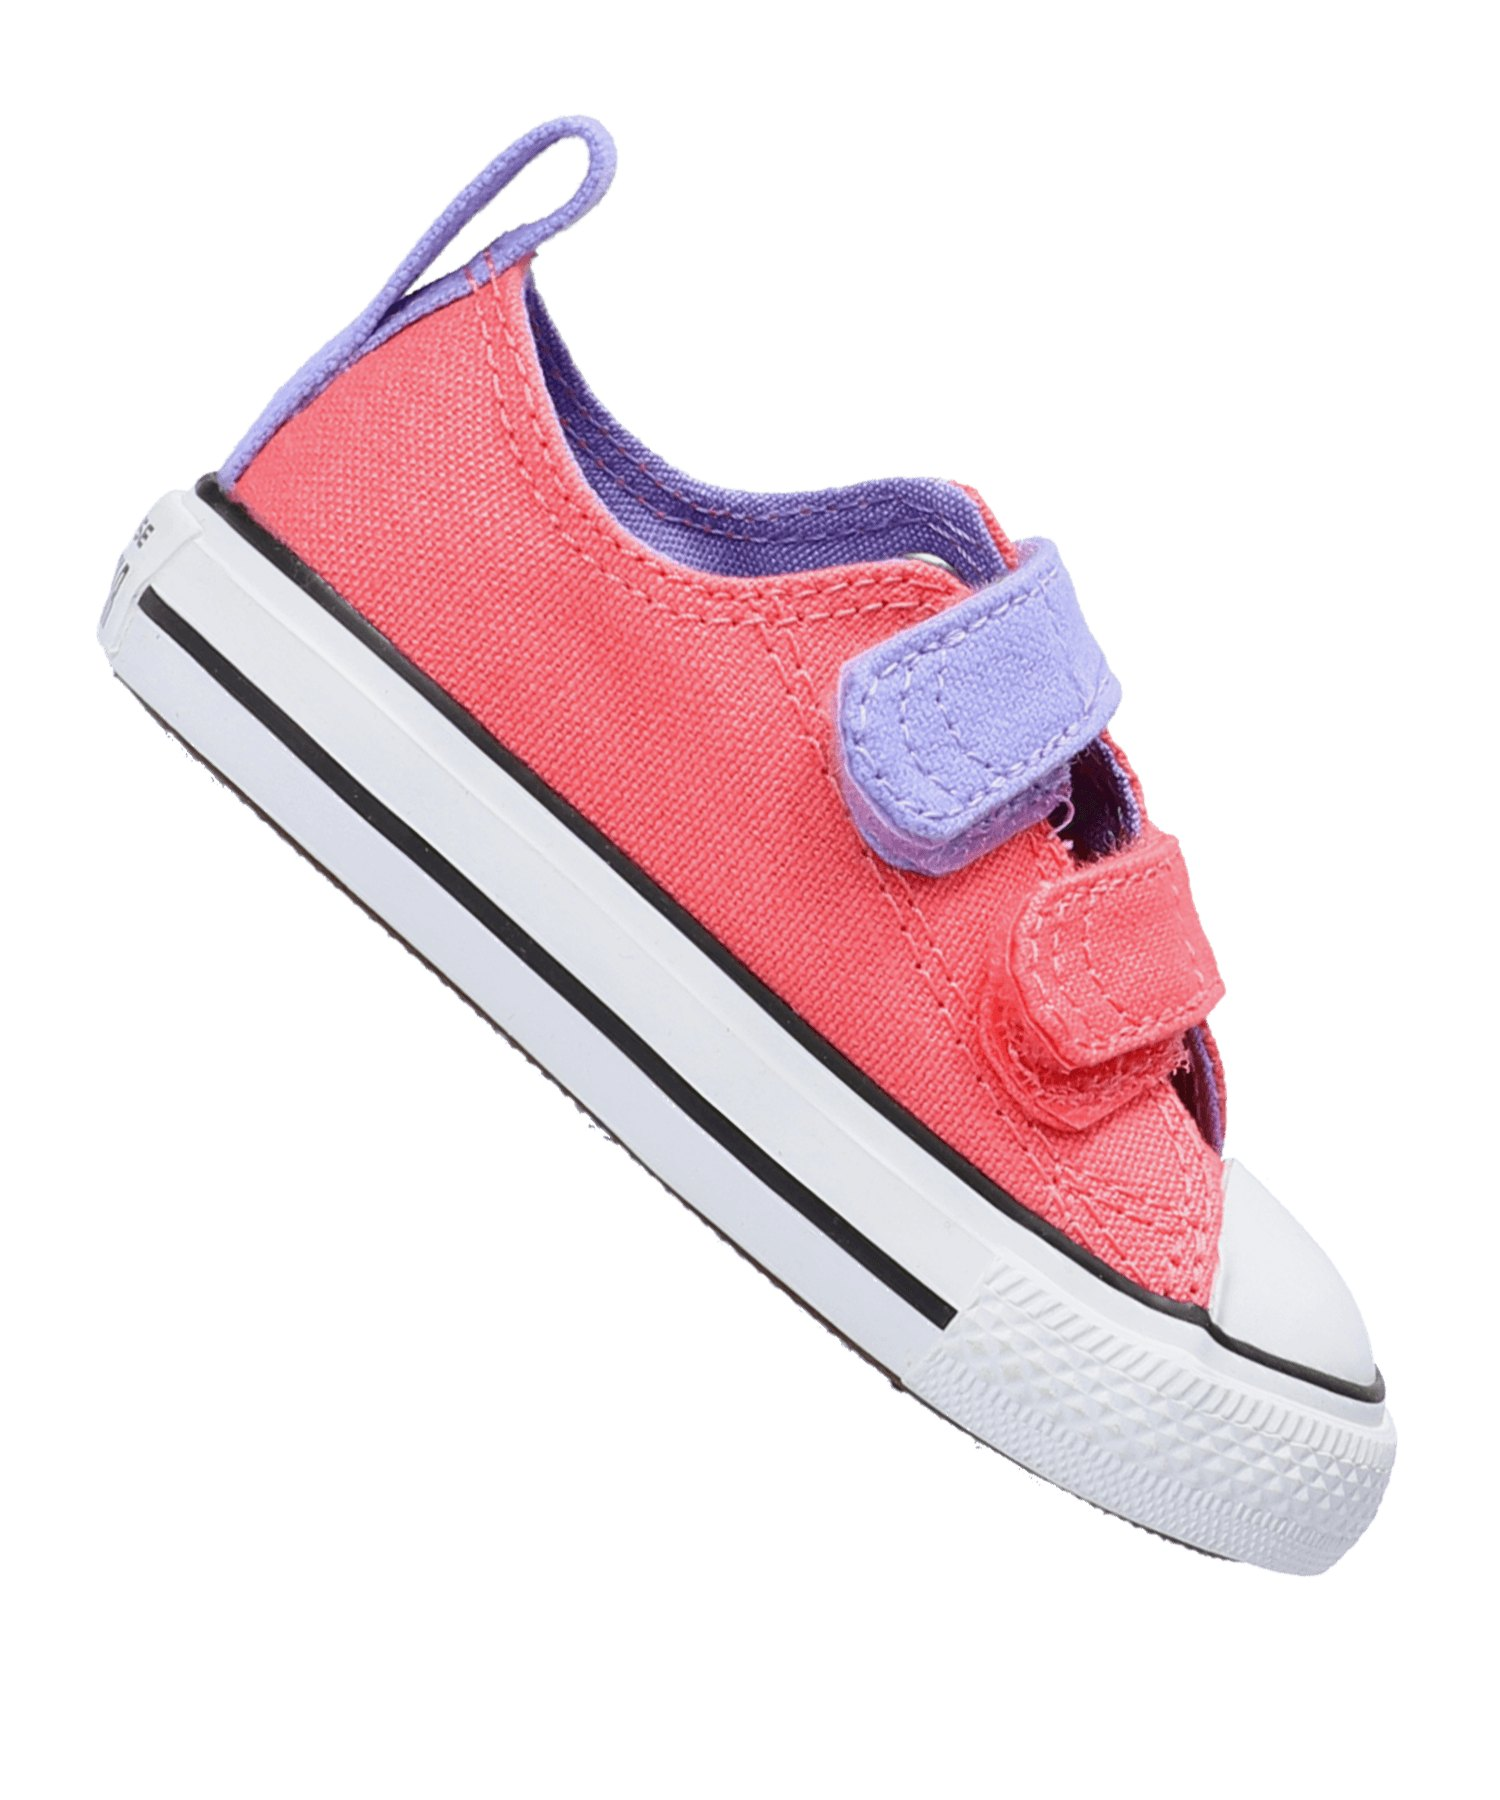 Converse Chuck Taylor AS V2 Ox Sneaker Kids Pink - Pink